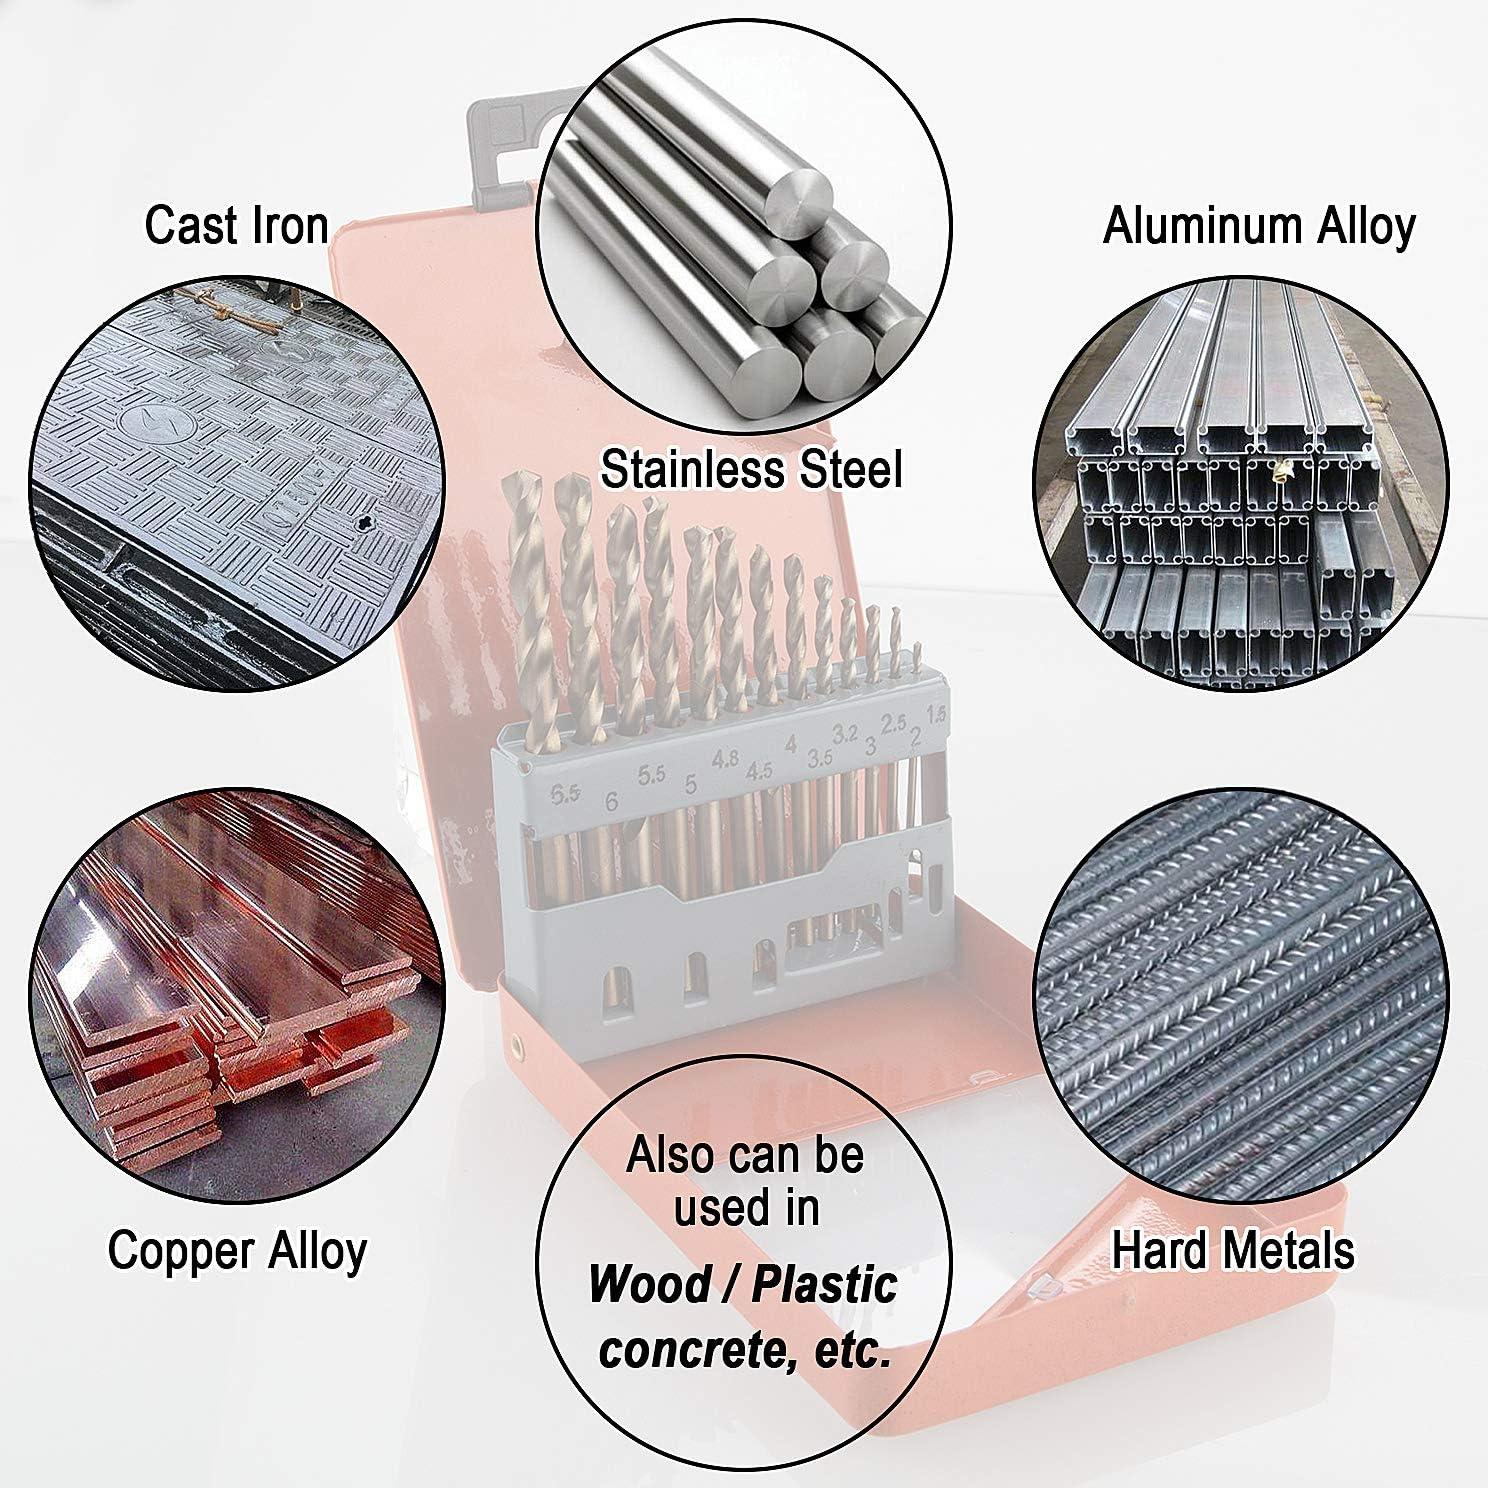 13pcs Hard Material Wood 1.5-6.5 mm CenterZ Metric M35 HSS Cobalt Jobber Drill Bits Assorted Multi-Purpose Twist Drill Bit Set for Concrete Metal Index Case Thick Stainless Steel Cast Iron